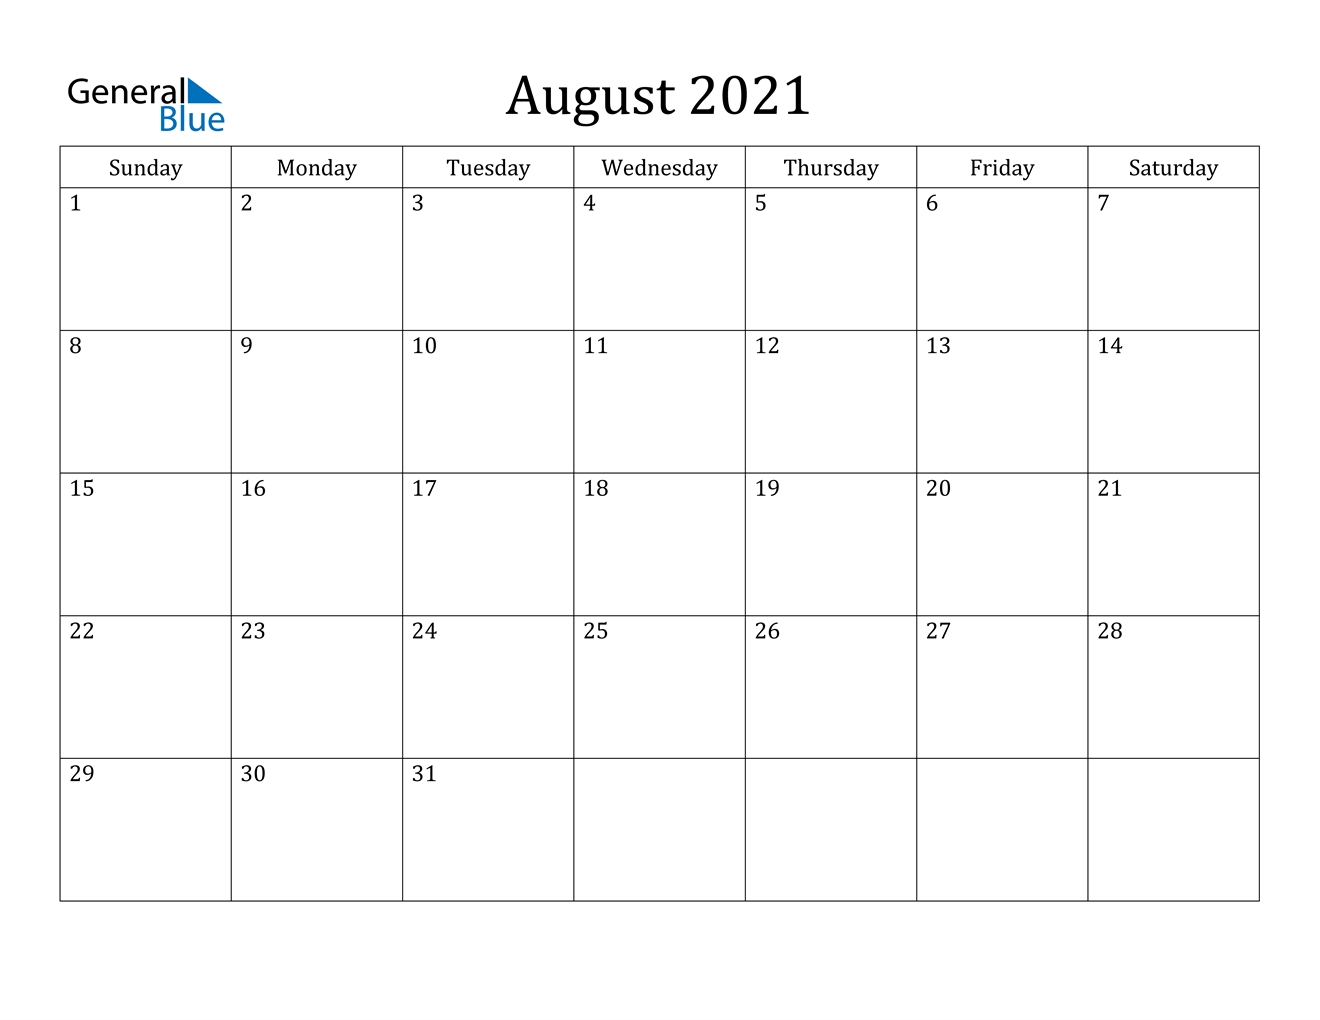 Take 2021 August Calendar